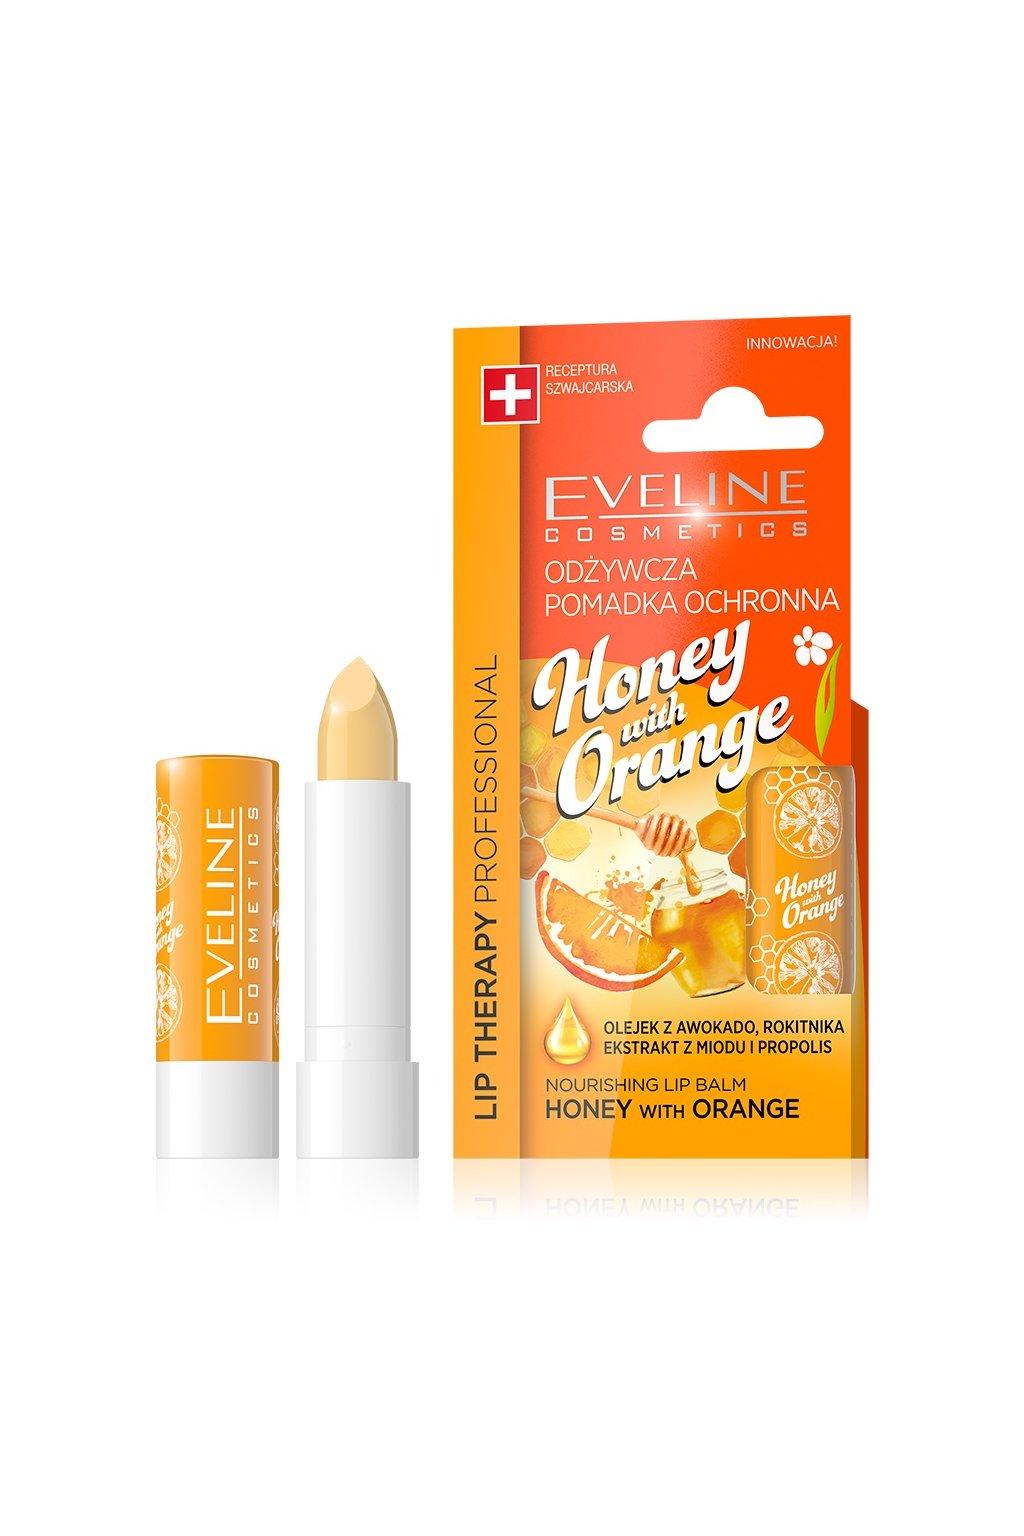 eveline cosmetics lip therapy ovocna vazelina na rty s ptichuti medu a pomerance